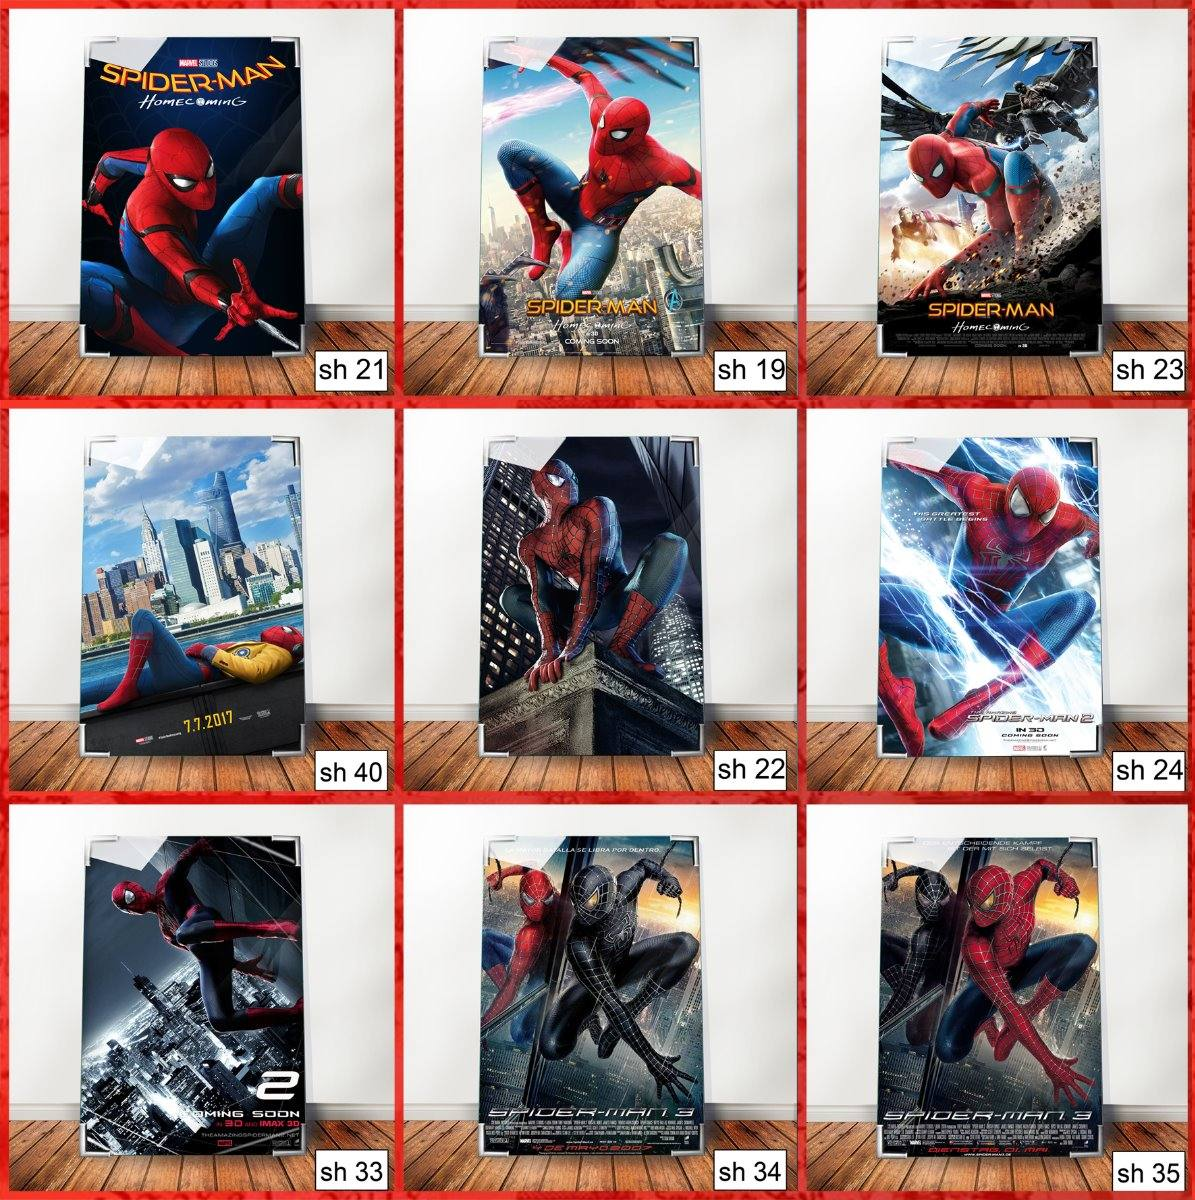 Cuadros Pelicula Marvel Comic Spiderman 3 Super Heroe Sh35 - $ 350 ...